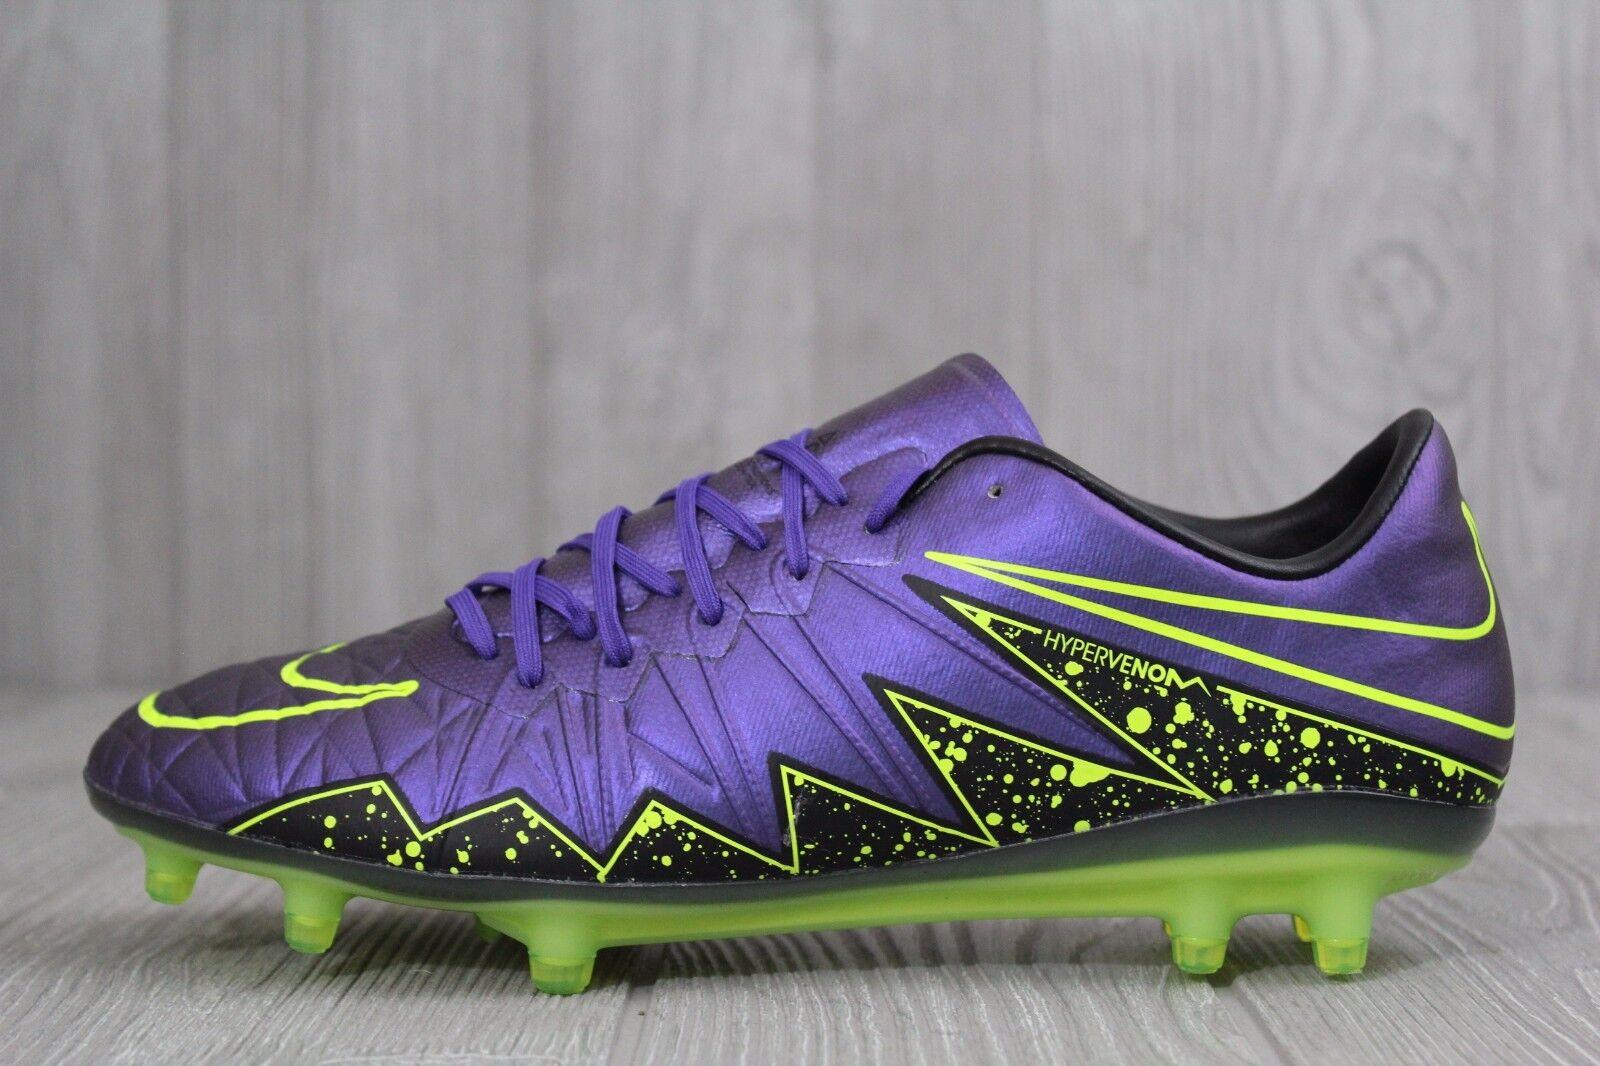 20 Nike Hypervenom Phinish FG Soccer Cleats ACC Grape Size 7 Wmns 8.5 749901-551